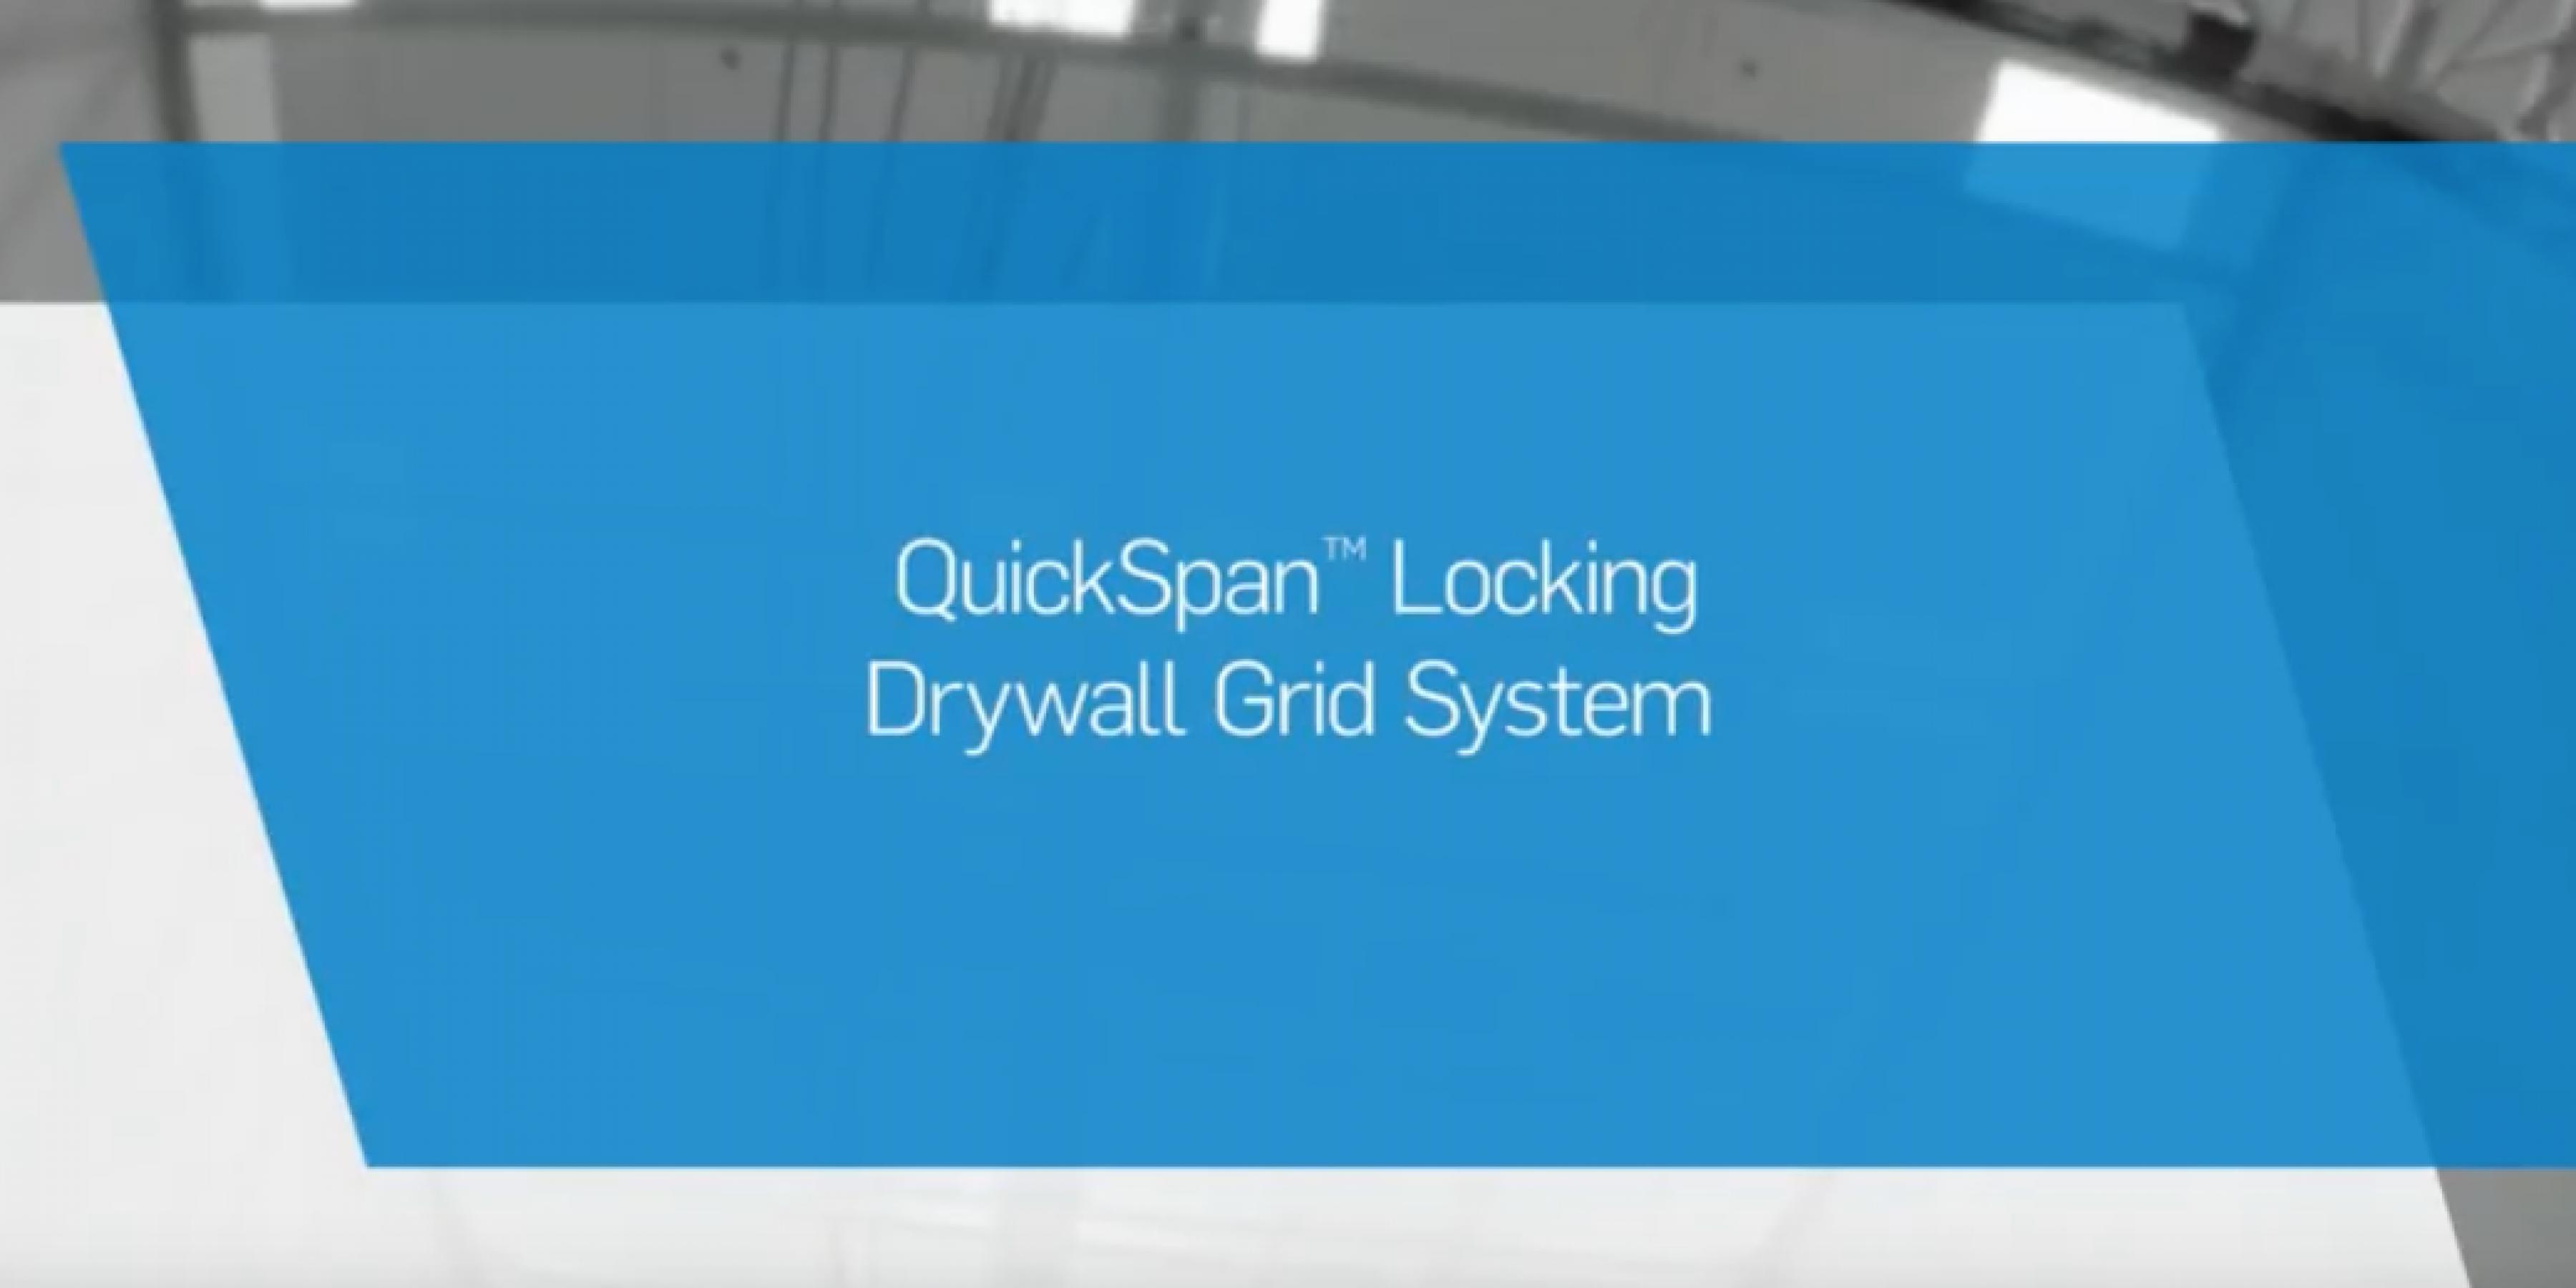 QuickSpan™ Locking Drywall Grid Installation Instructions